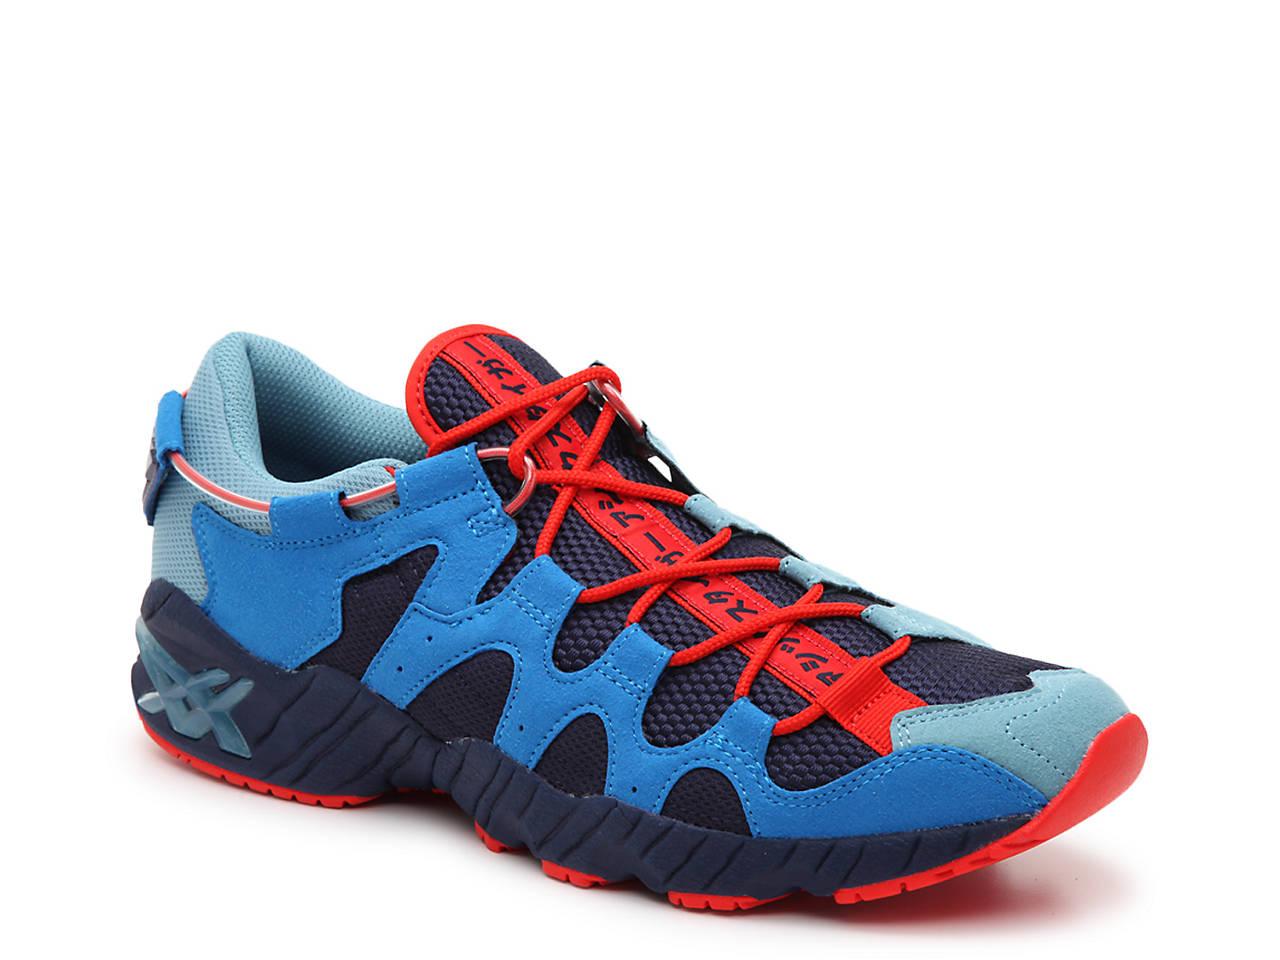 new product be0cb 1922a GEL-Mai Sneaker - Men's